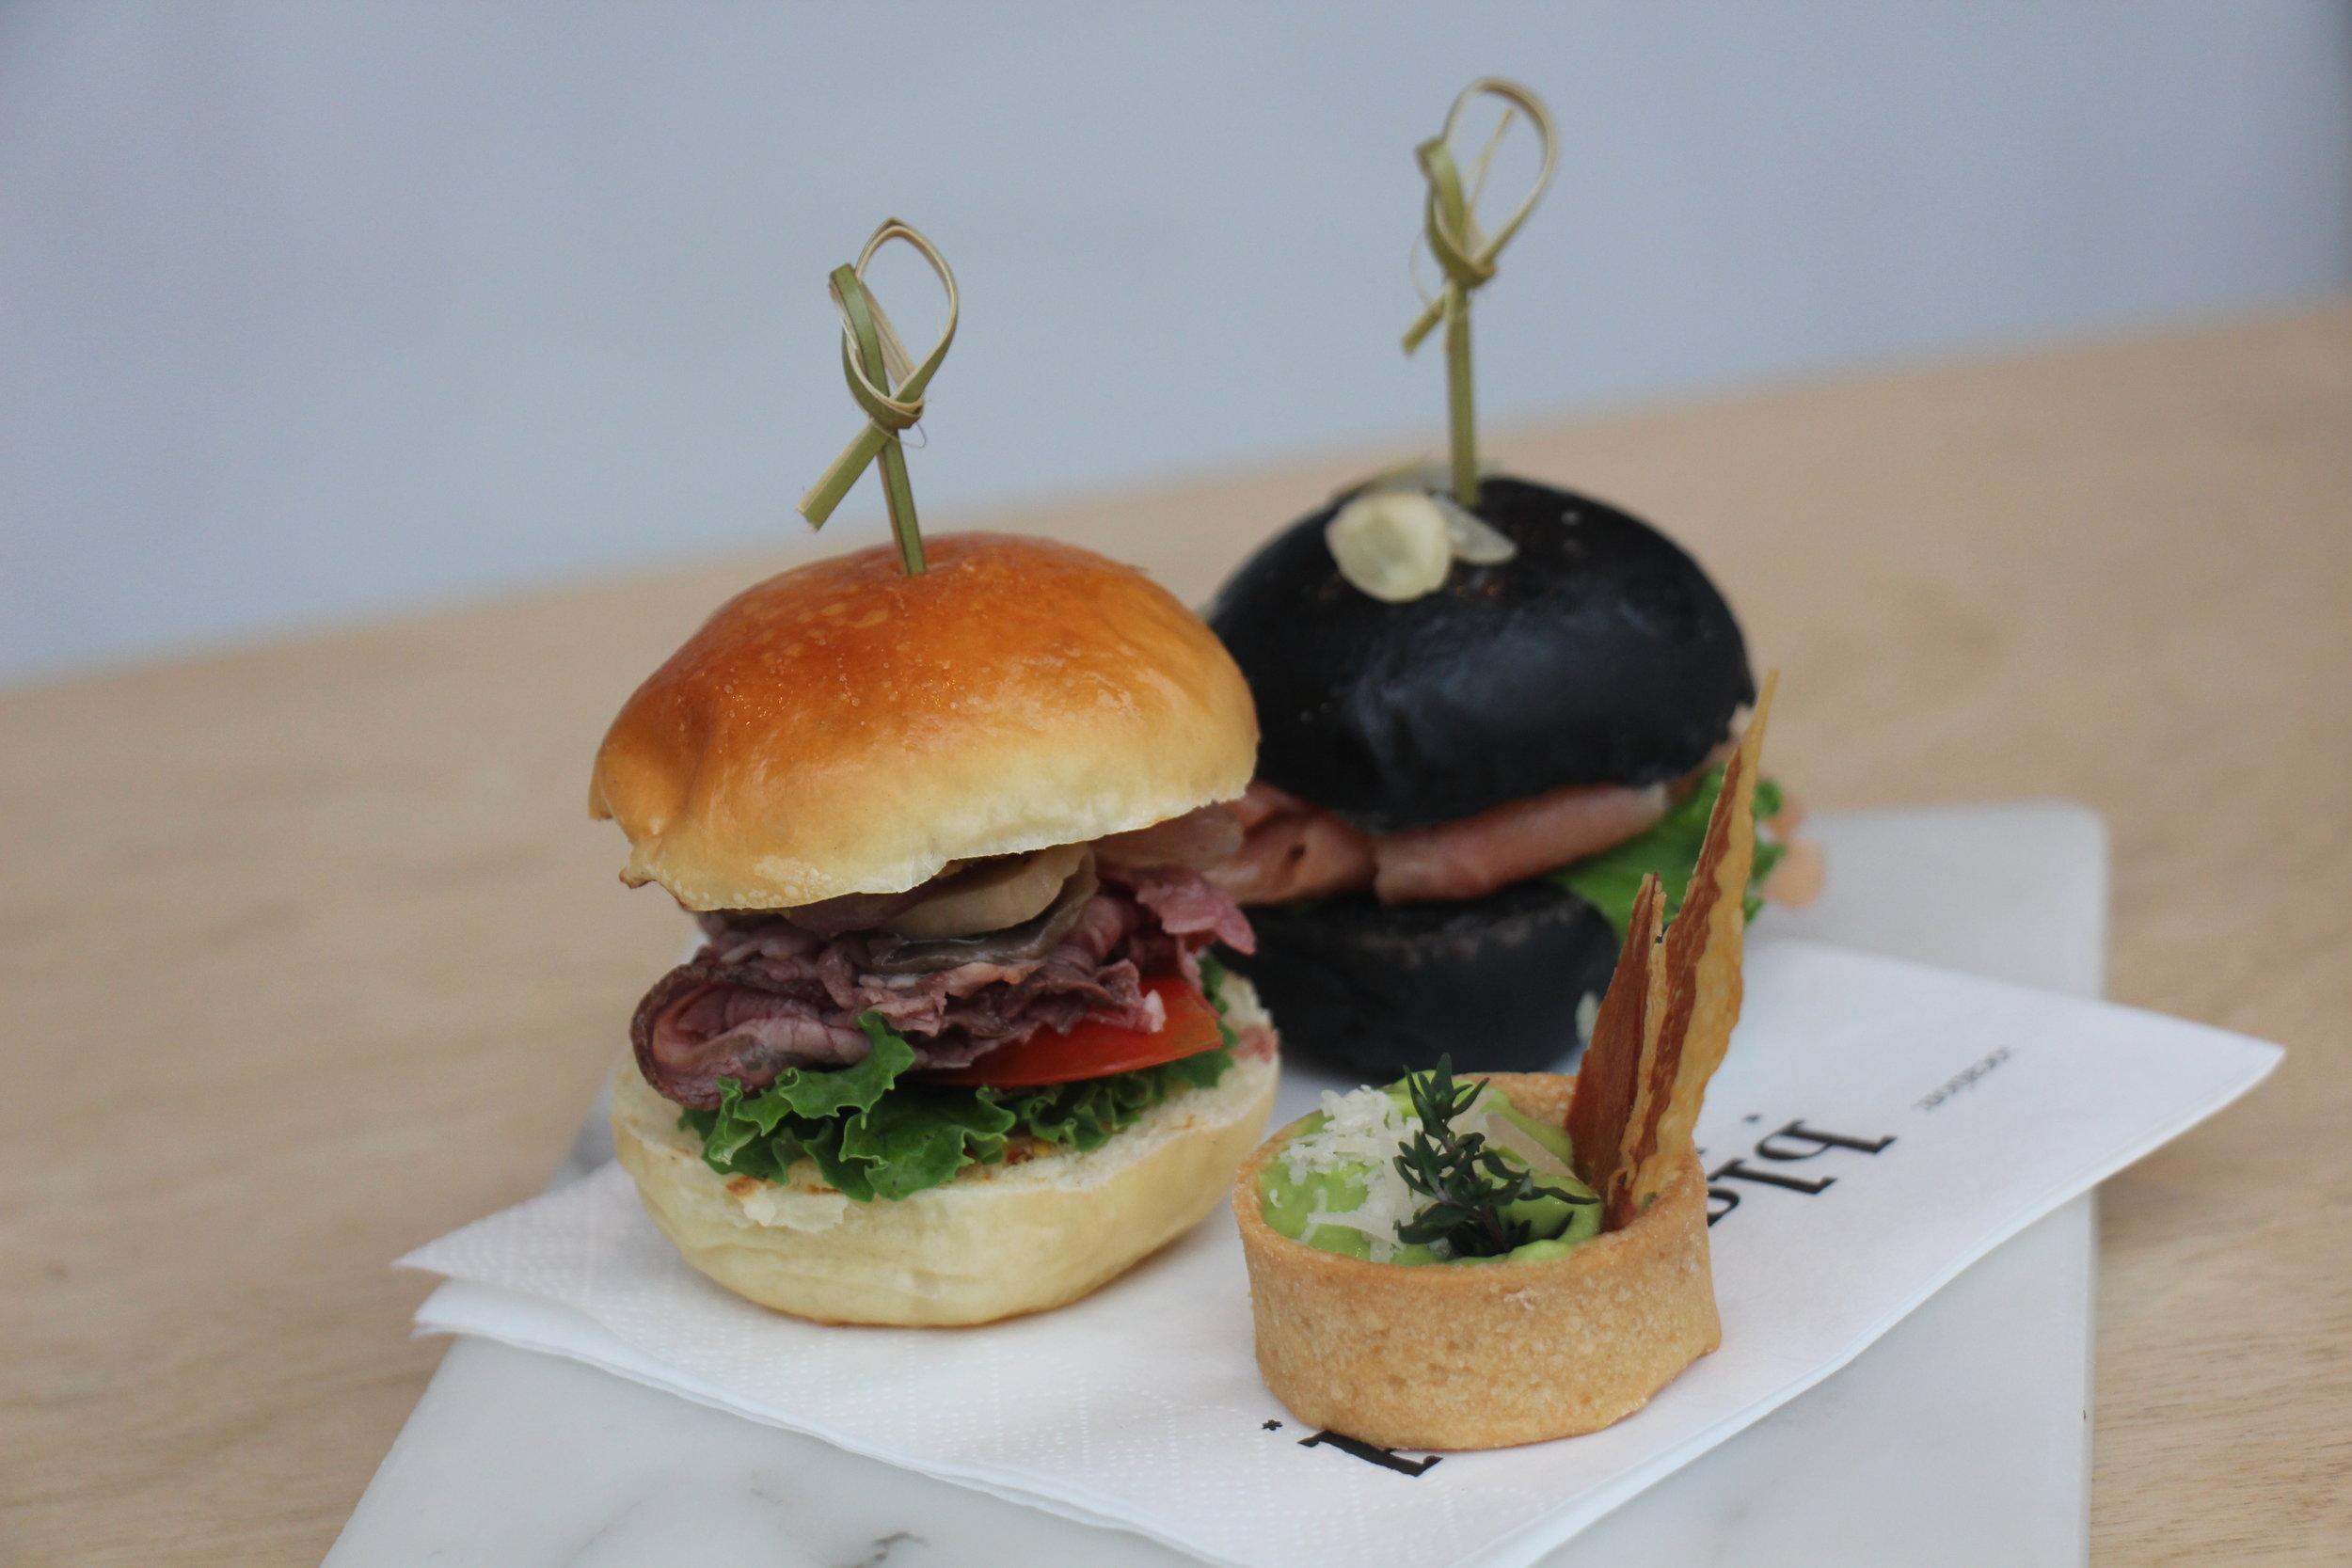 Left to right: Mini Roast Beef Burger, Mini Smoked Salmon, Thyme Pea Puree Tart with Crispy Parma Ham